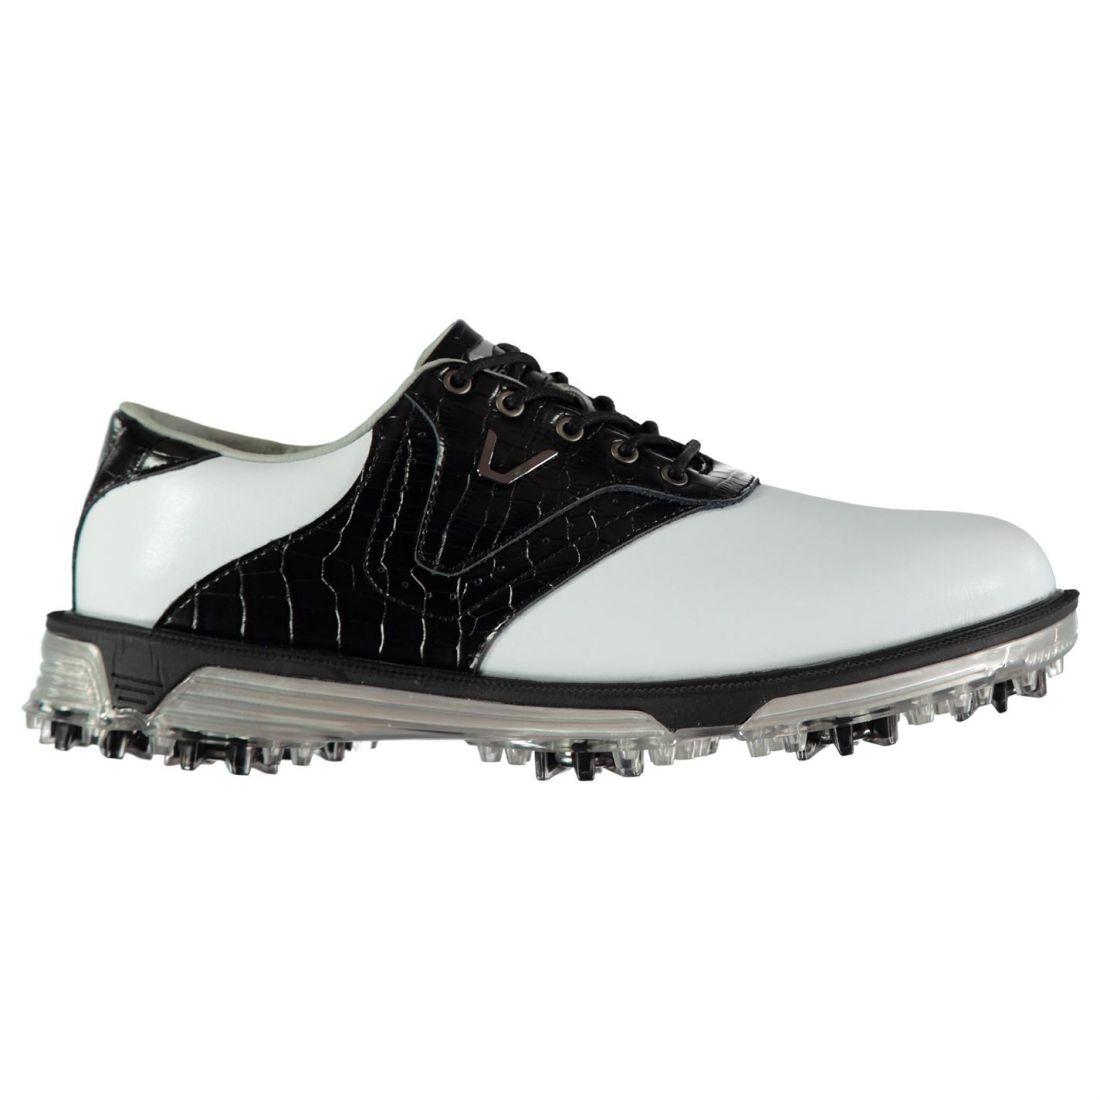 e20cd0a3d01 Slazenger V500 Golf Shoe Mens Gents Spiked Shoes Laces Fastened ...